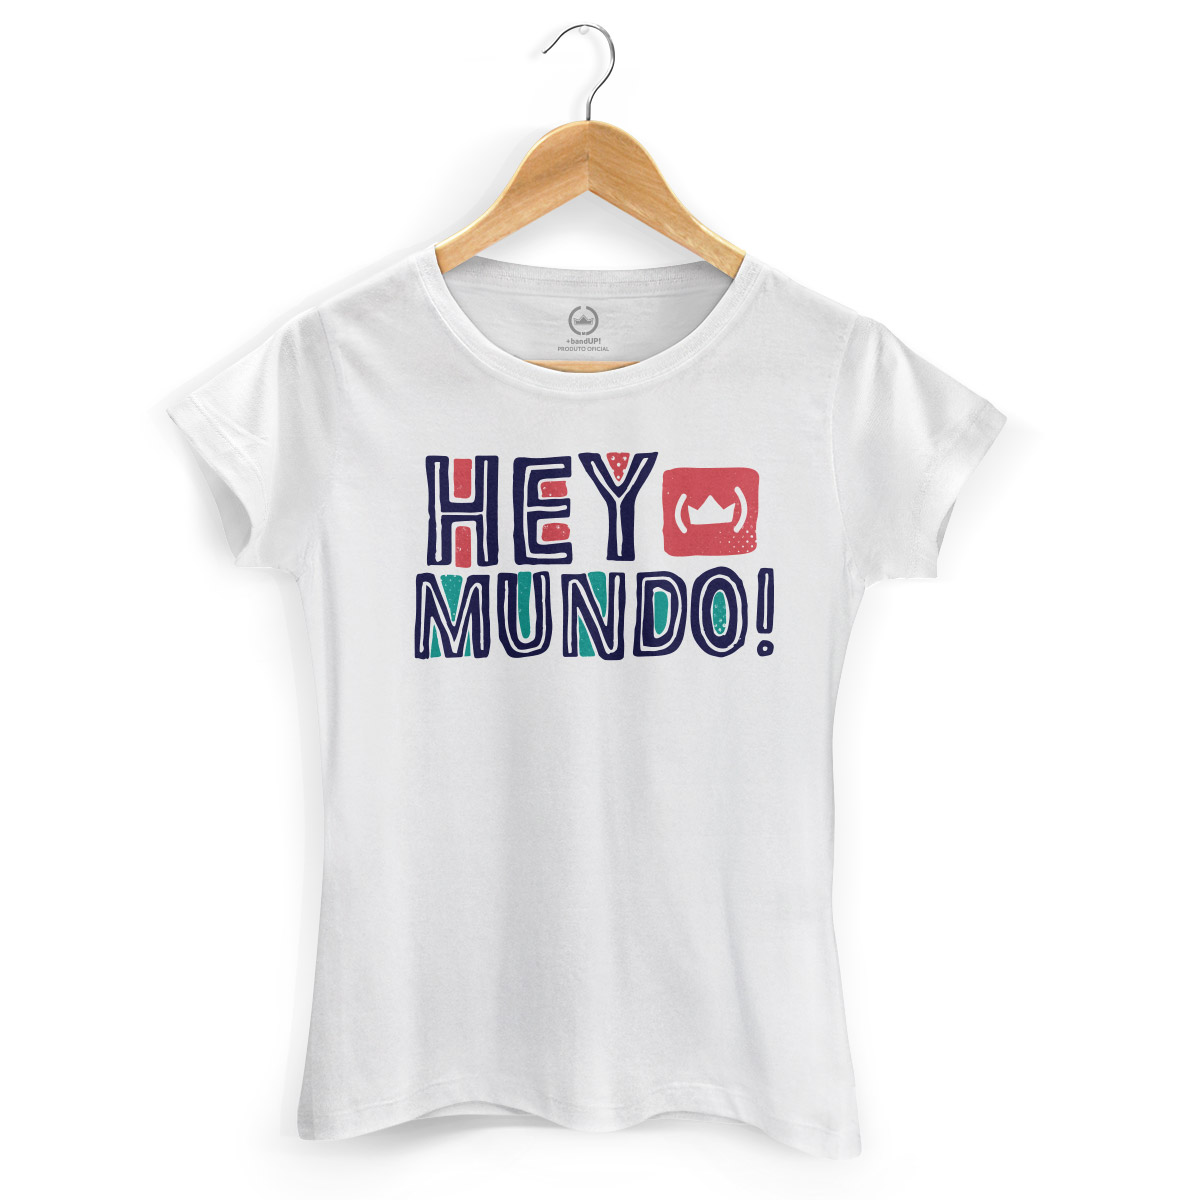 Camiseta Feminina Thiaguinho Hey Mundo! Logo